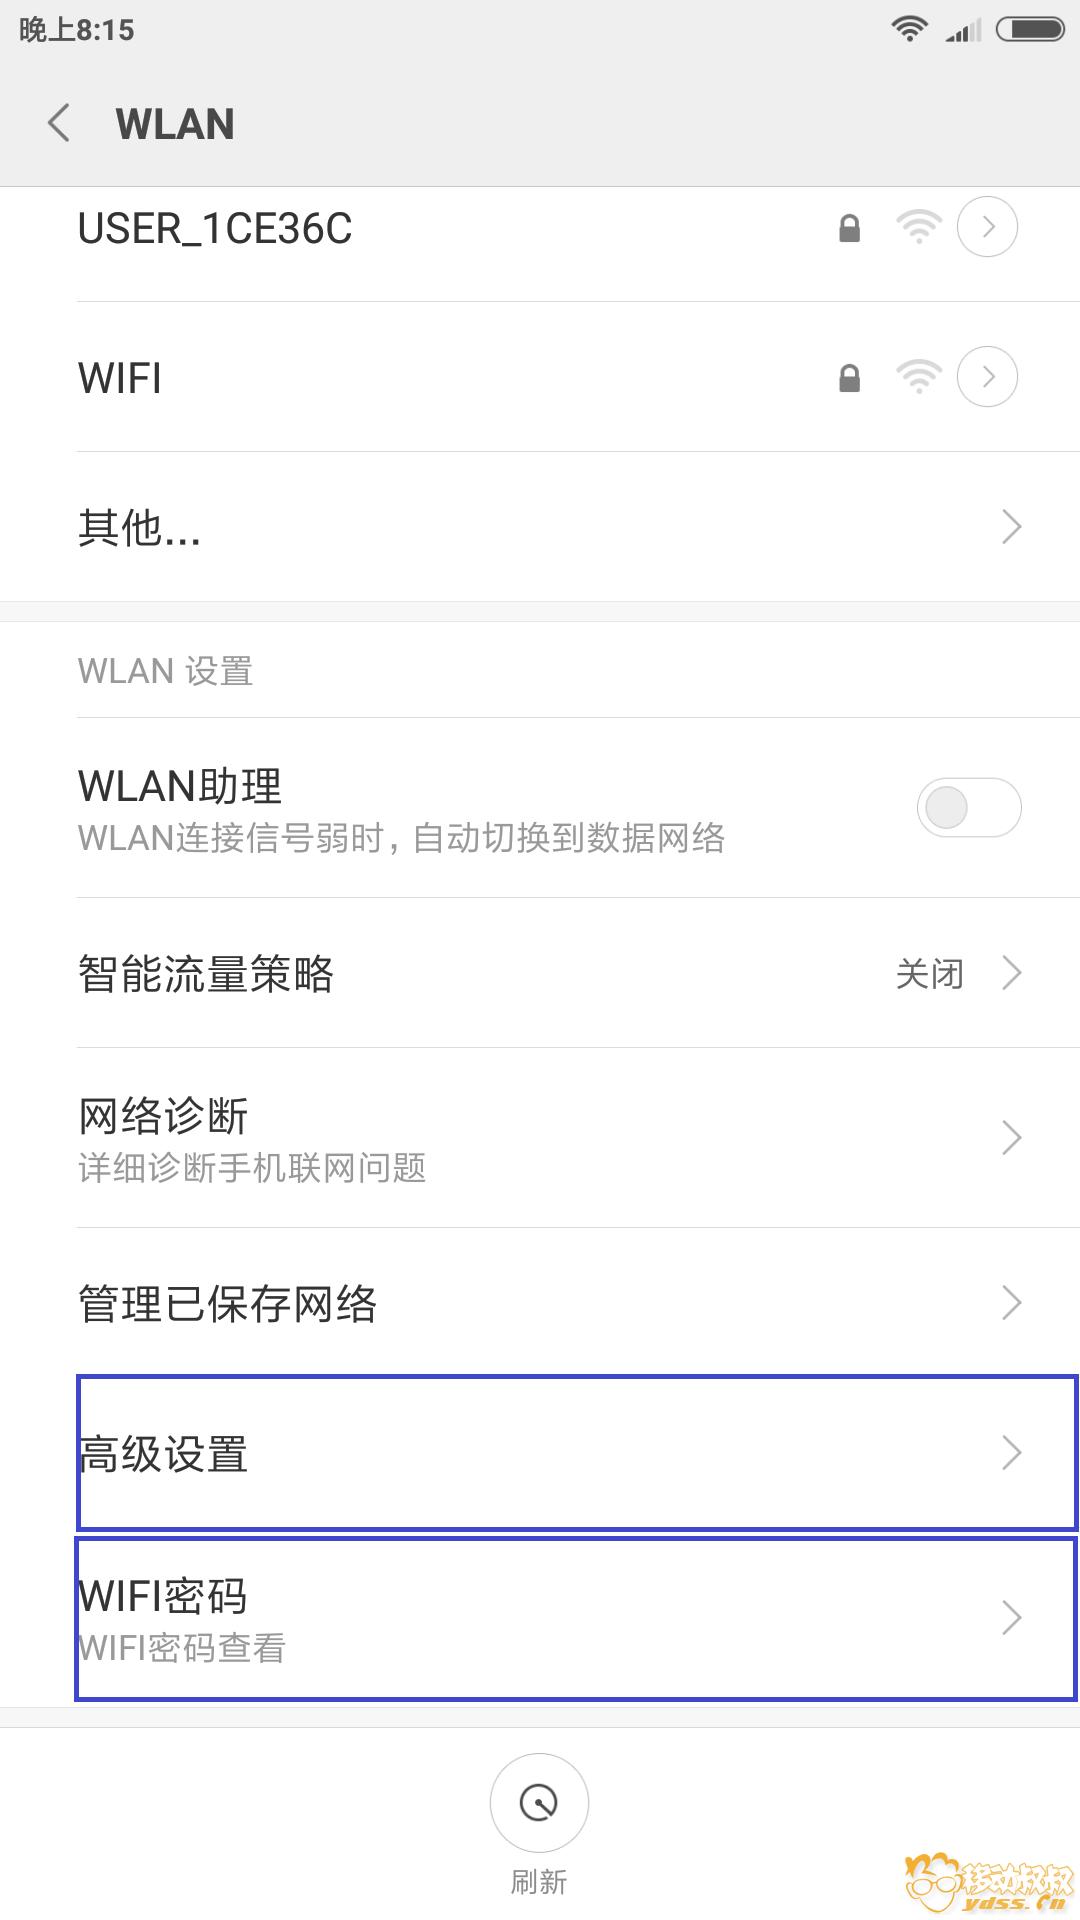 Screenshot_2018-02-28-20-15-37-335_com.android.settings.png